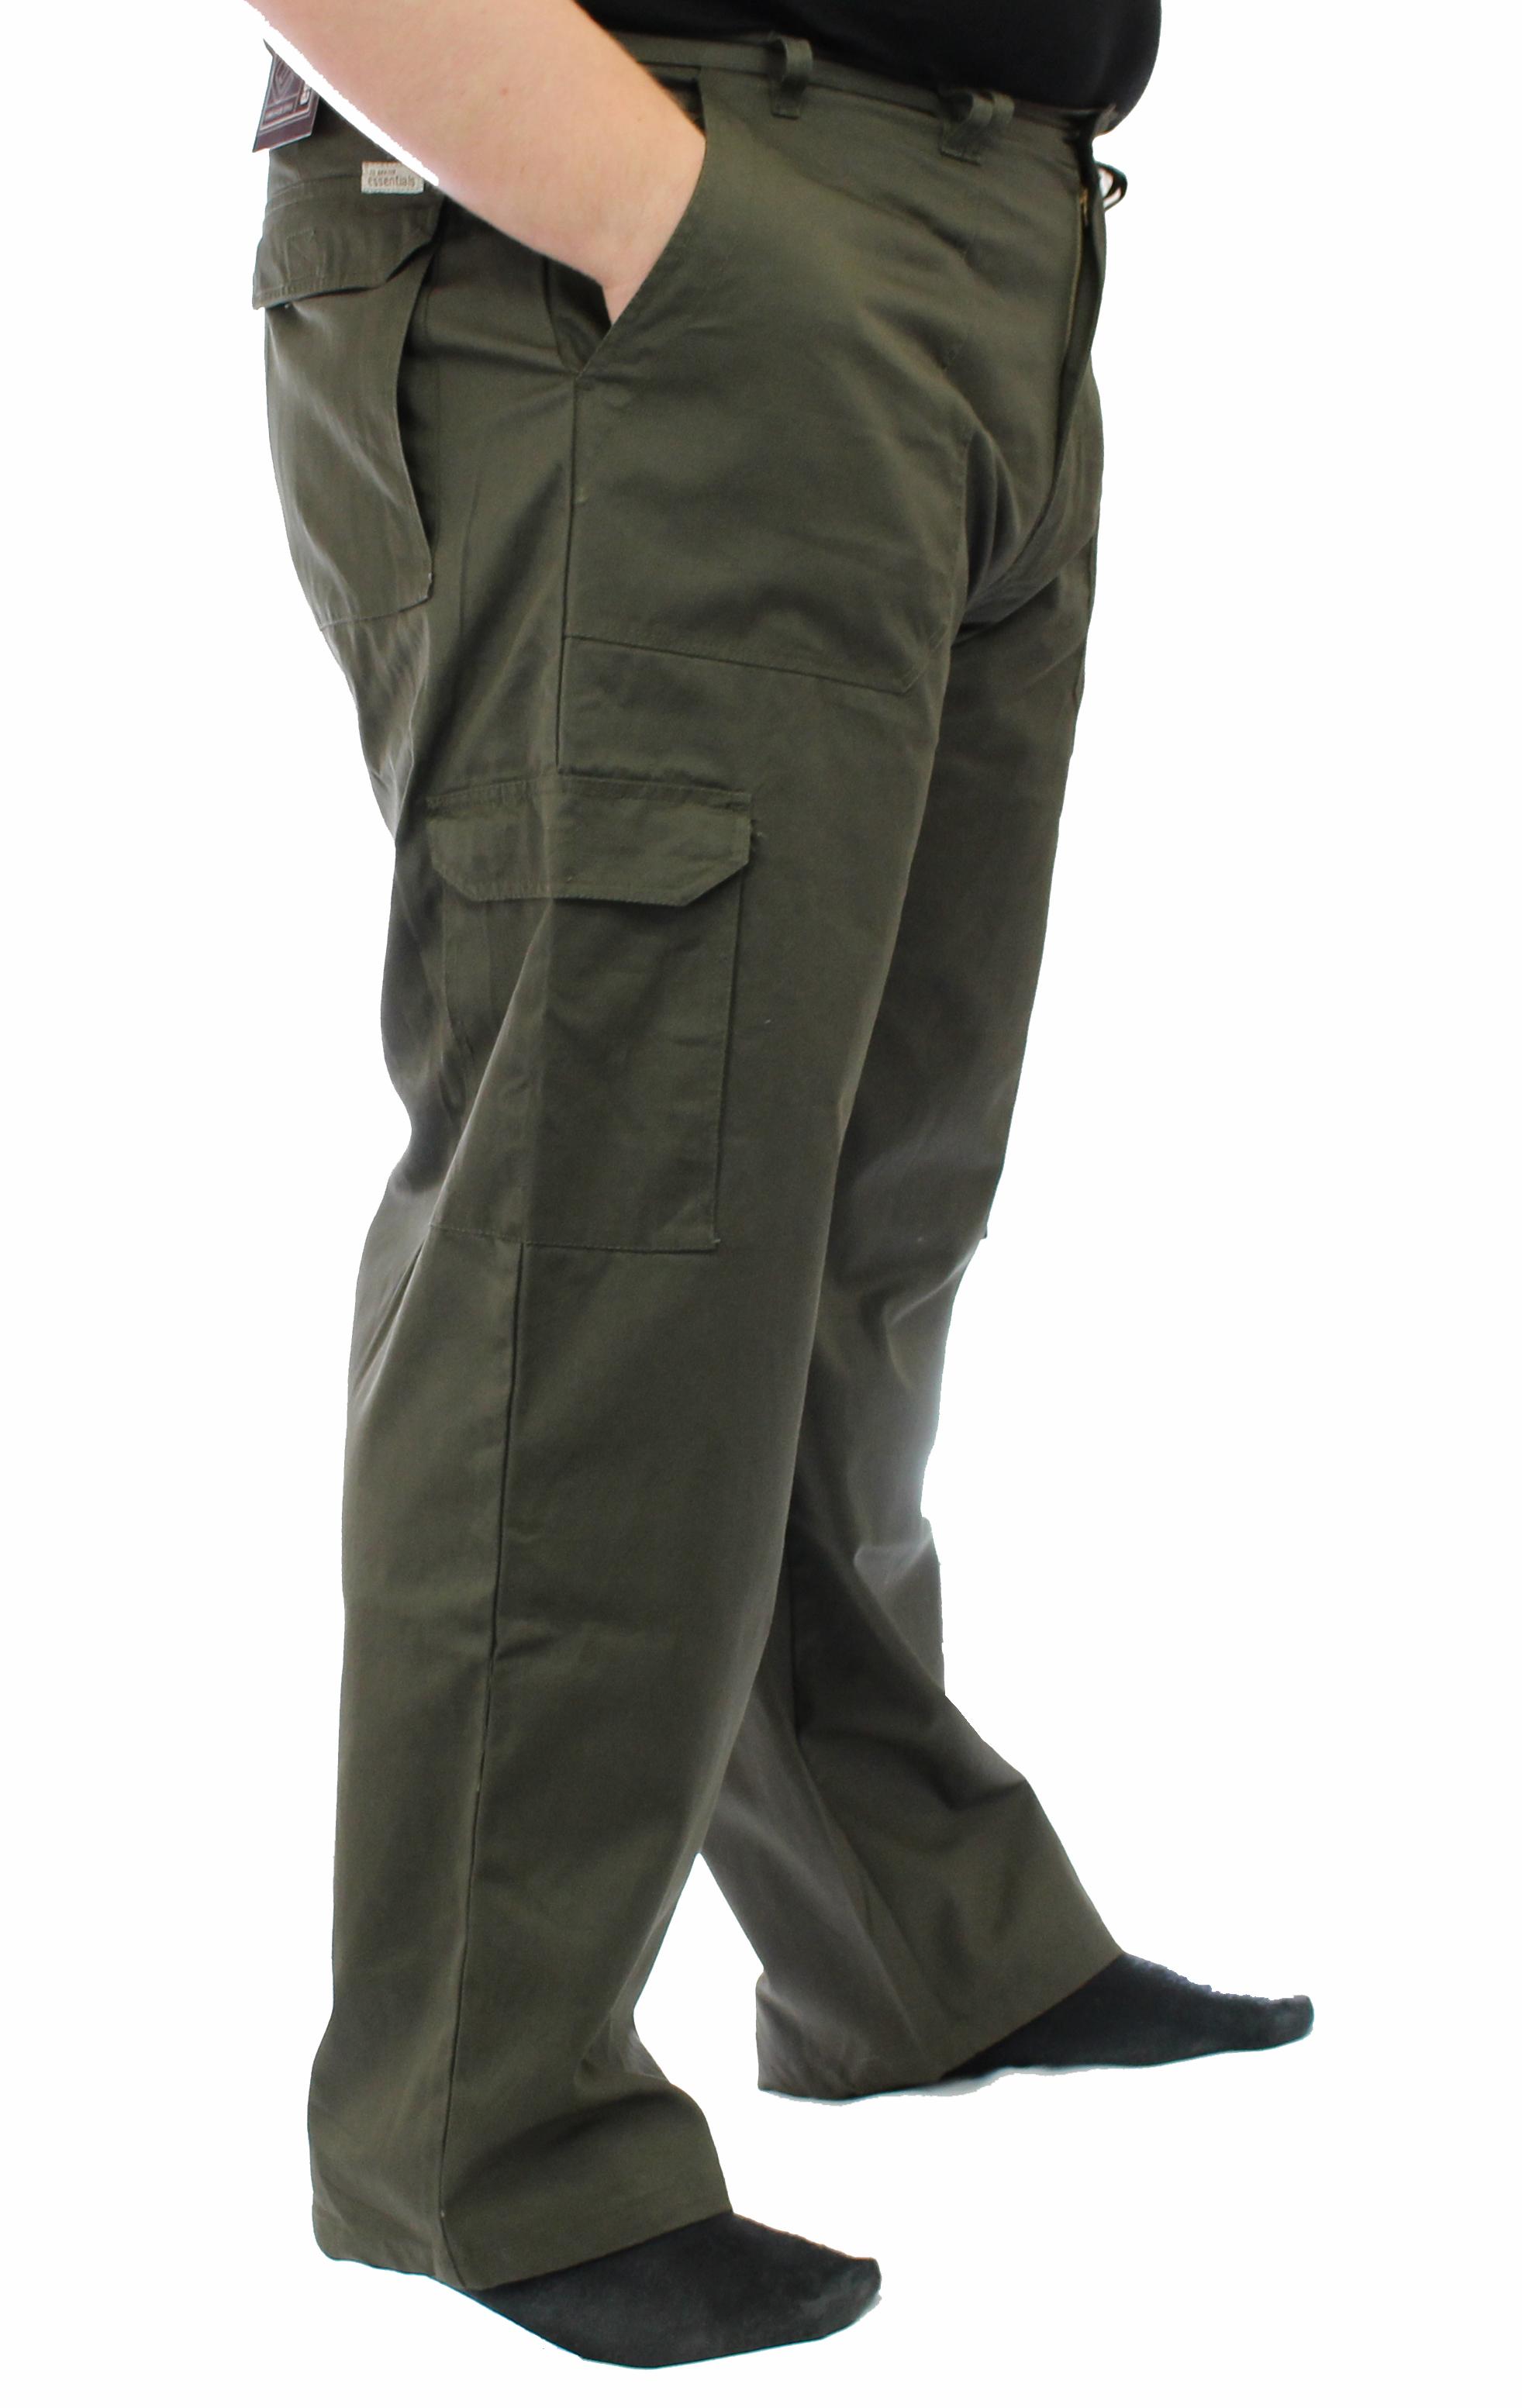 "Ed Baxter Victory - Heavy Duty Cargo Combat Trousers - Khaki - 42"" Waist, 30"" Leg"